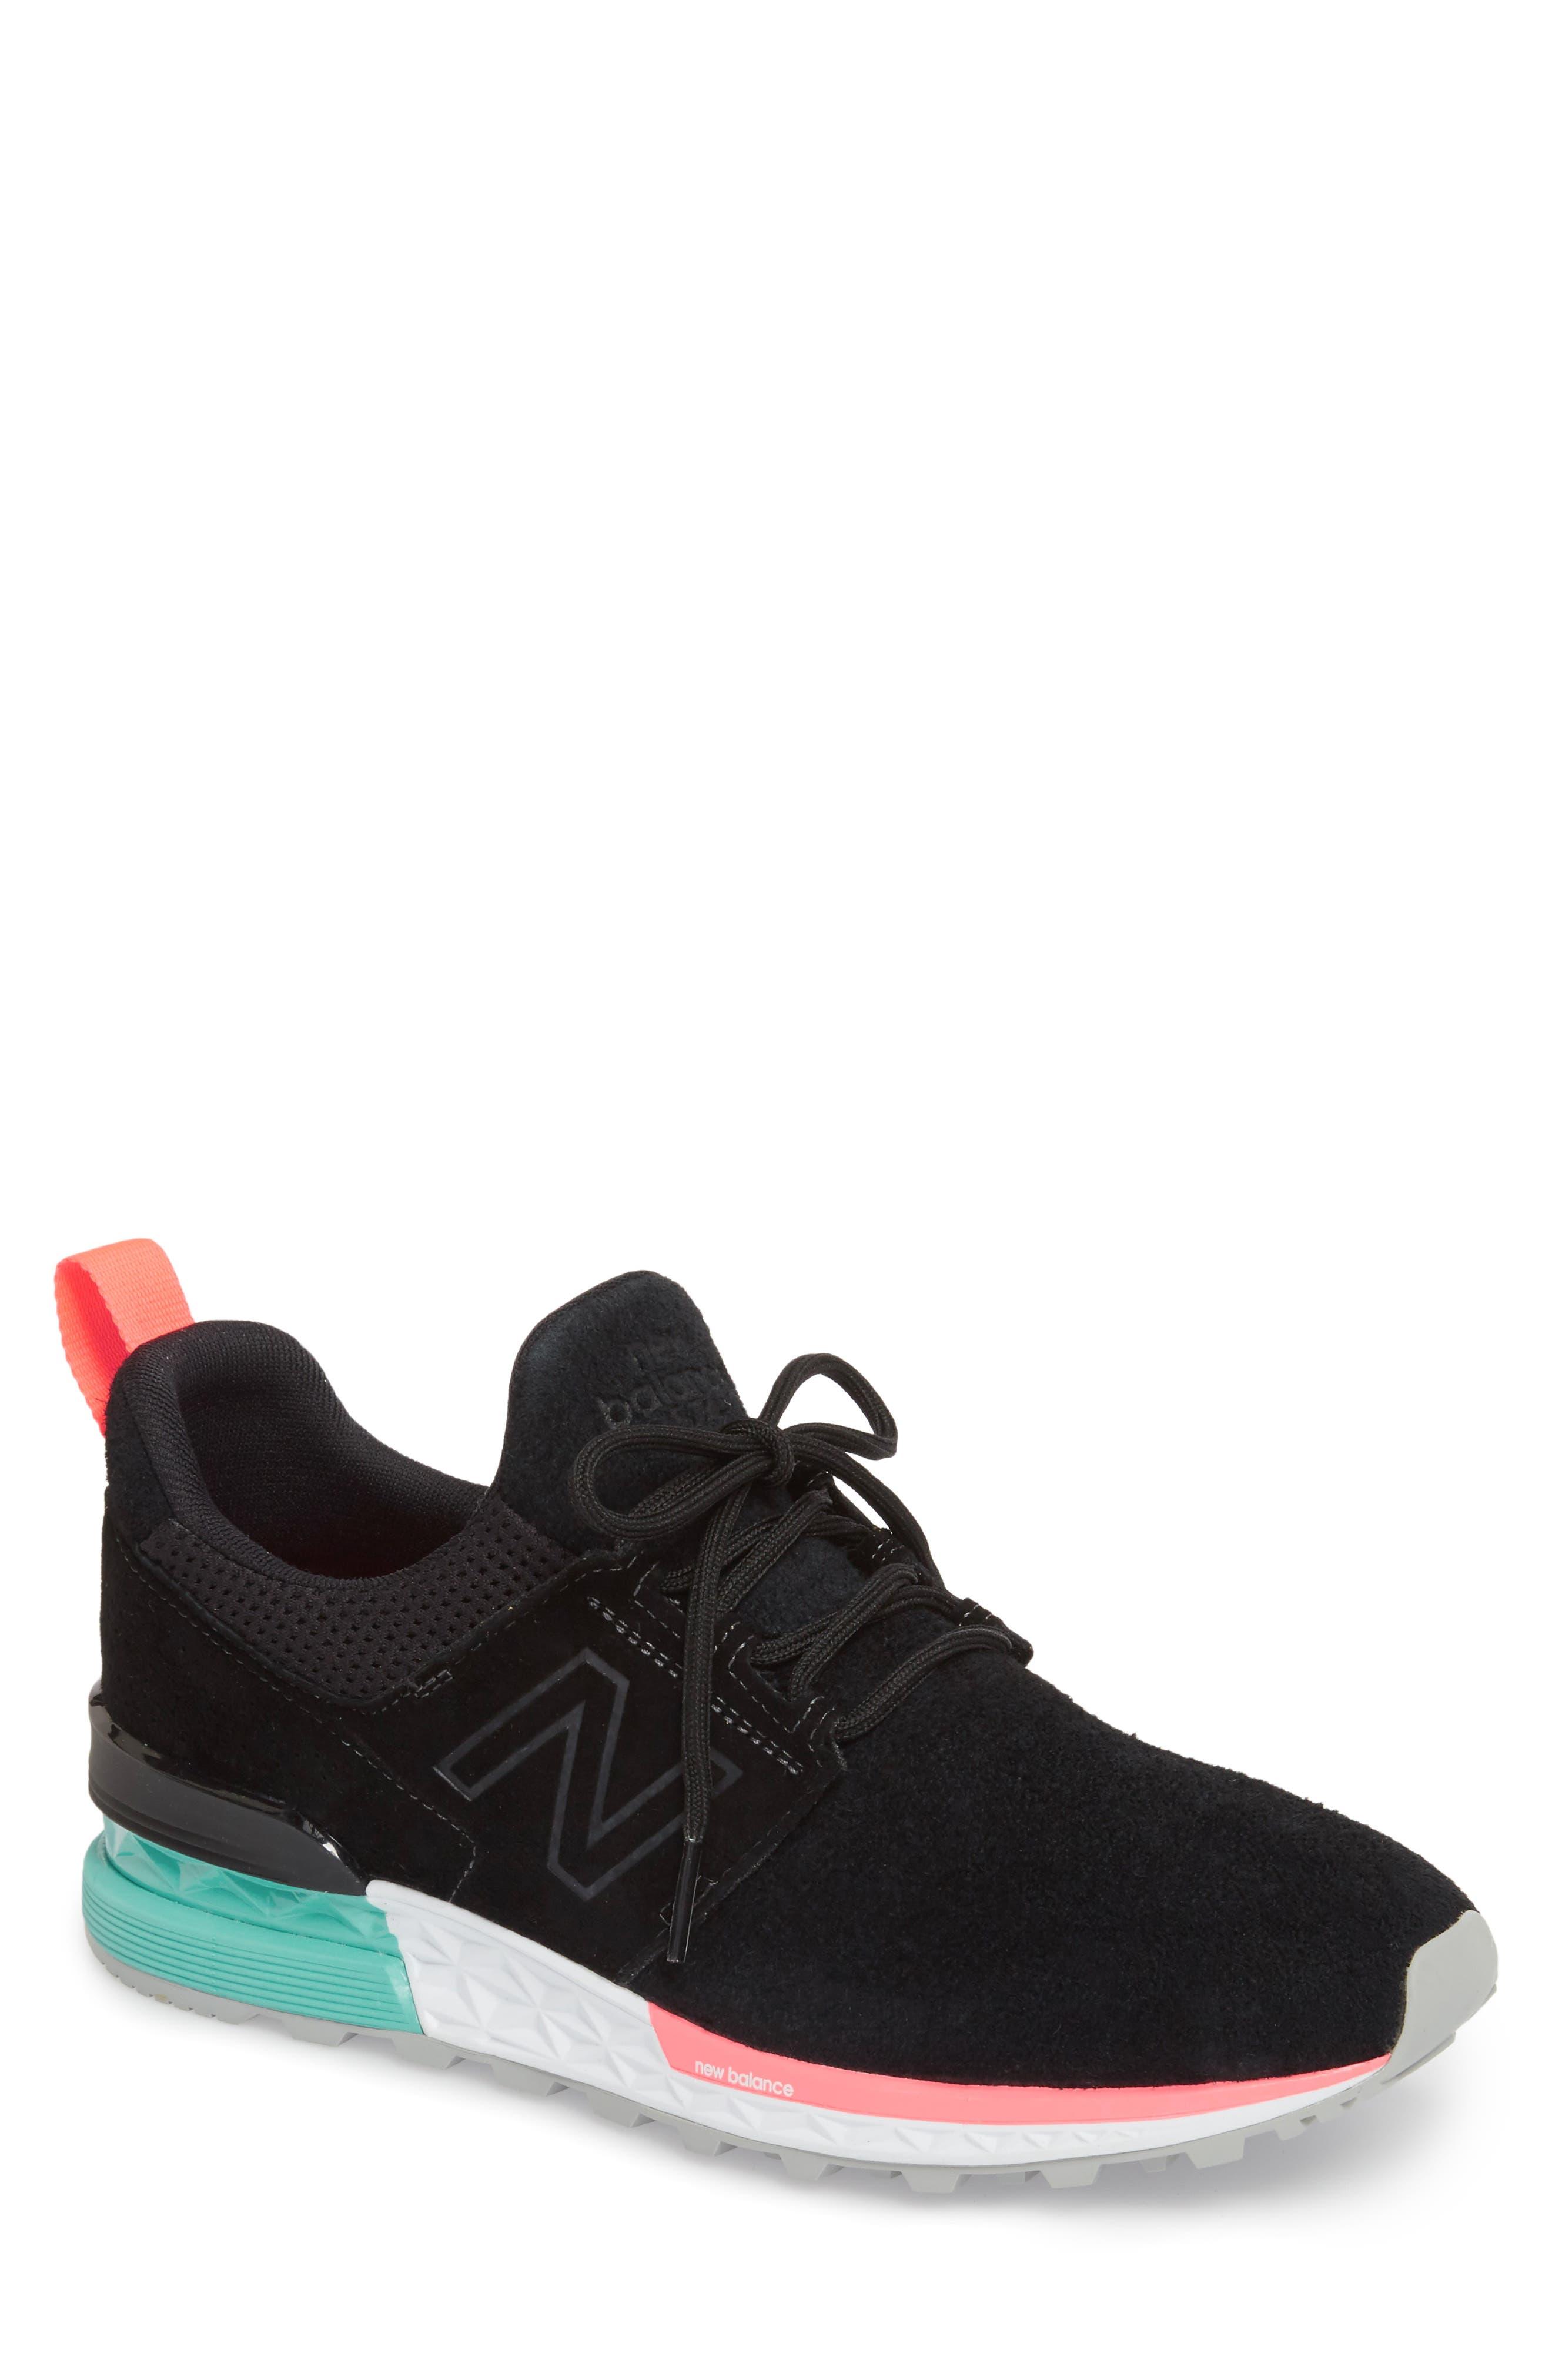 574 Sport Sneaker,                             Main thumbnail 1, color,                             001